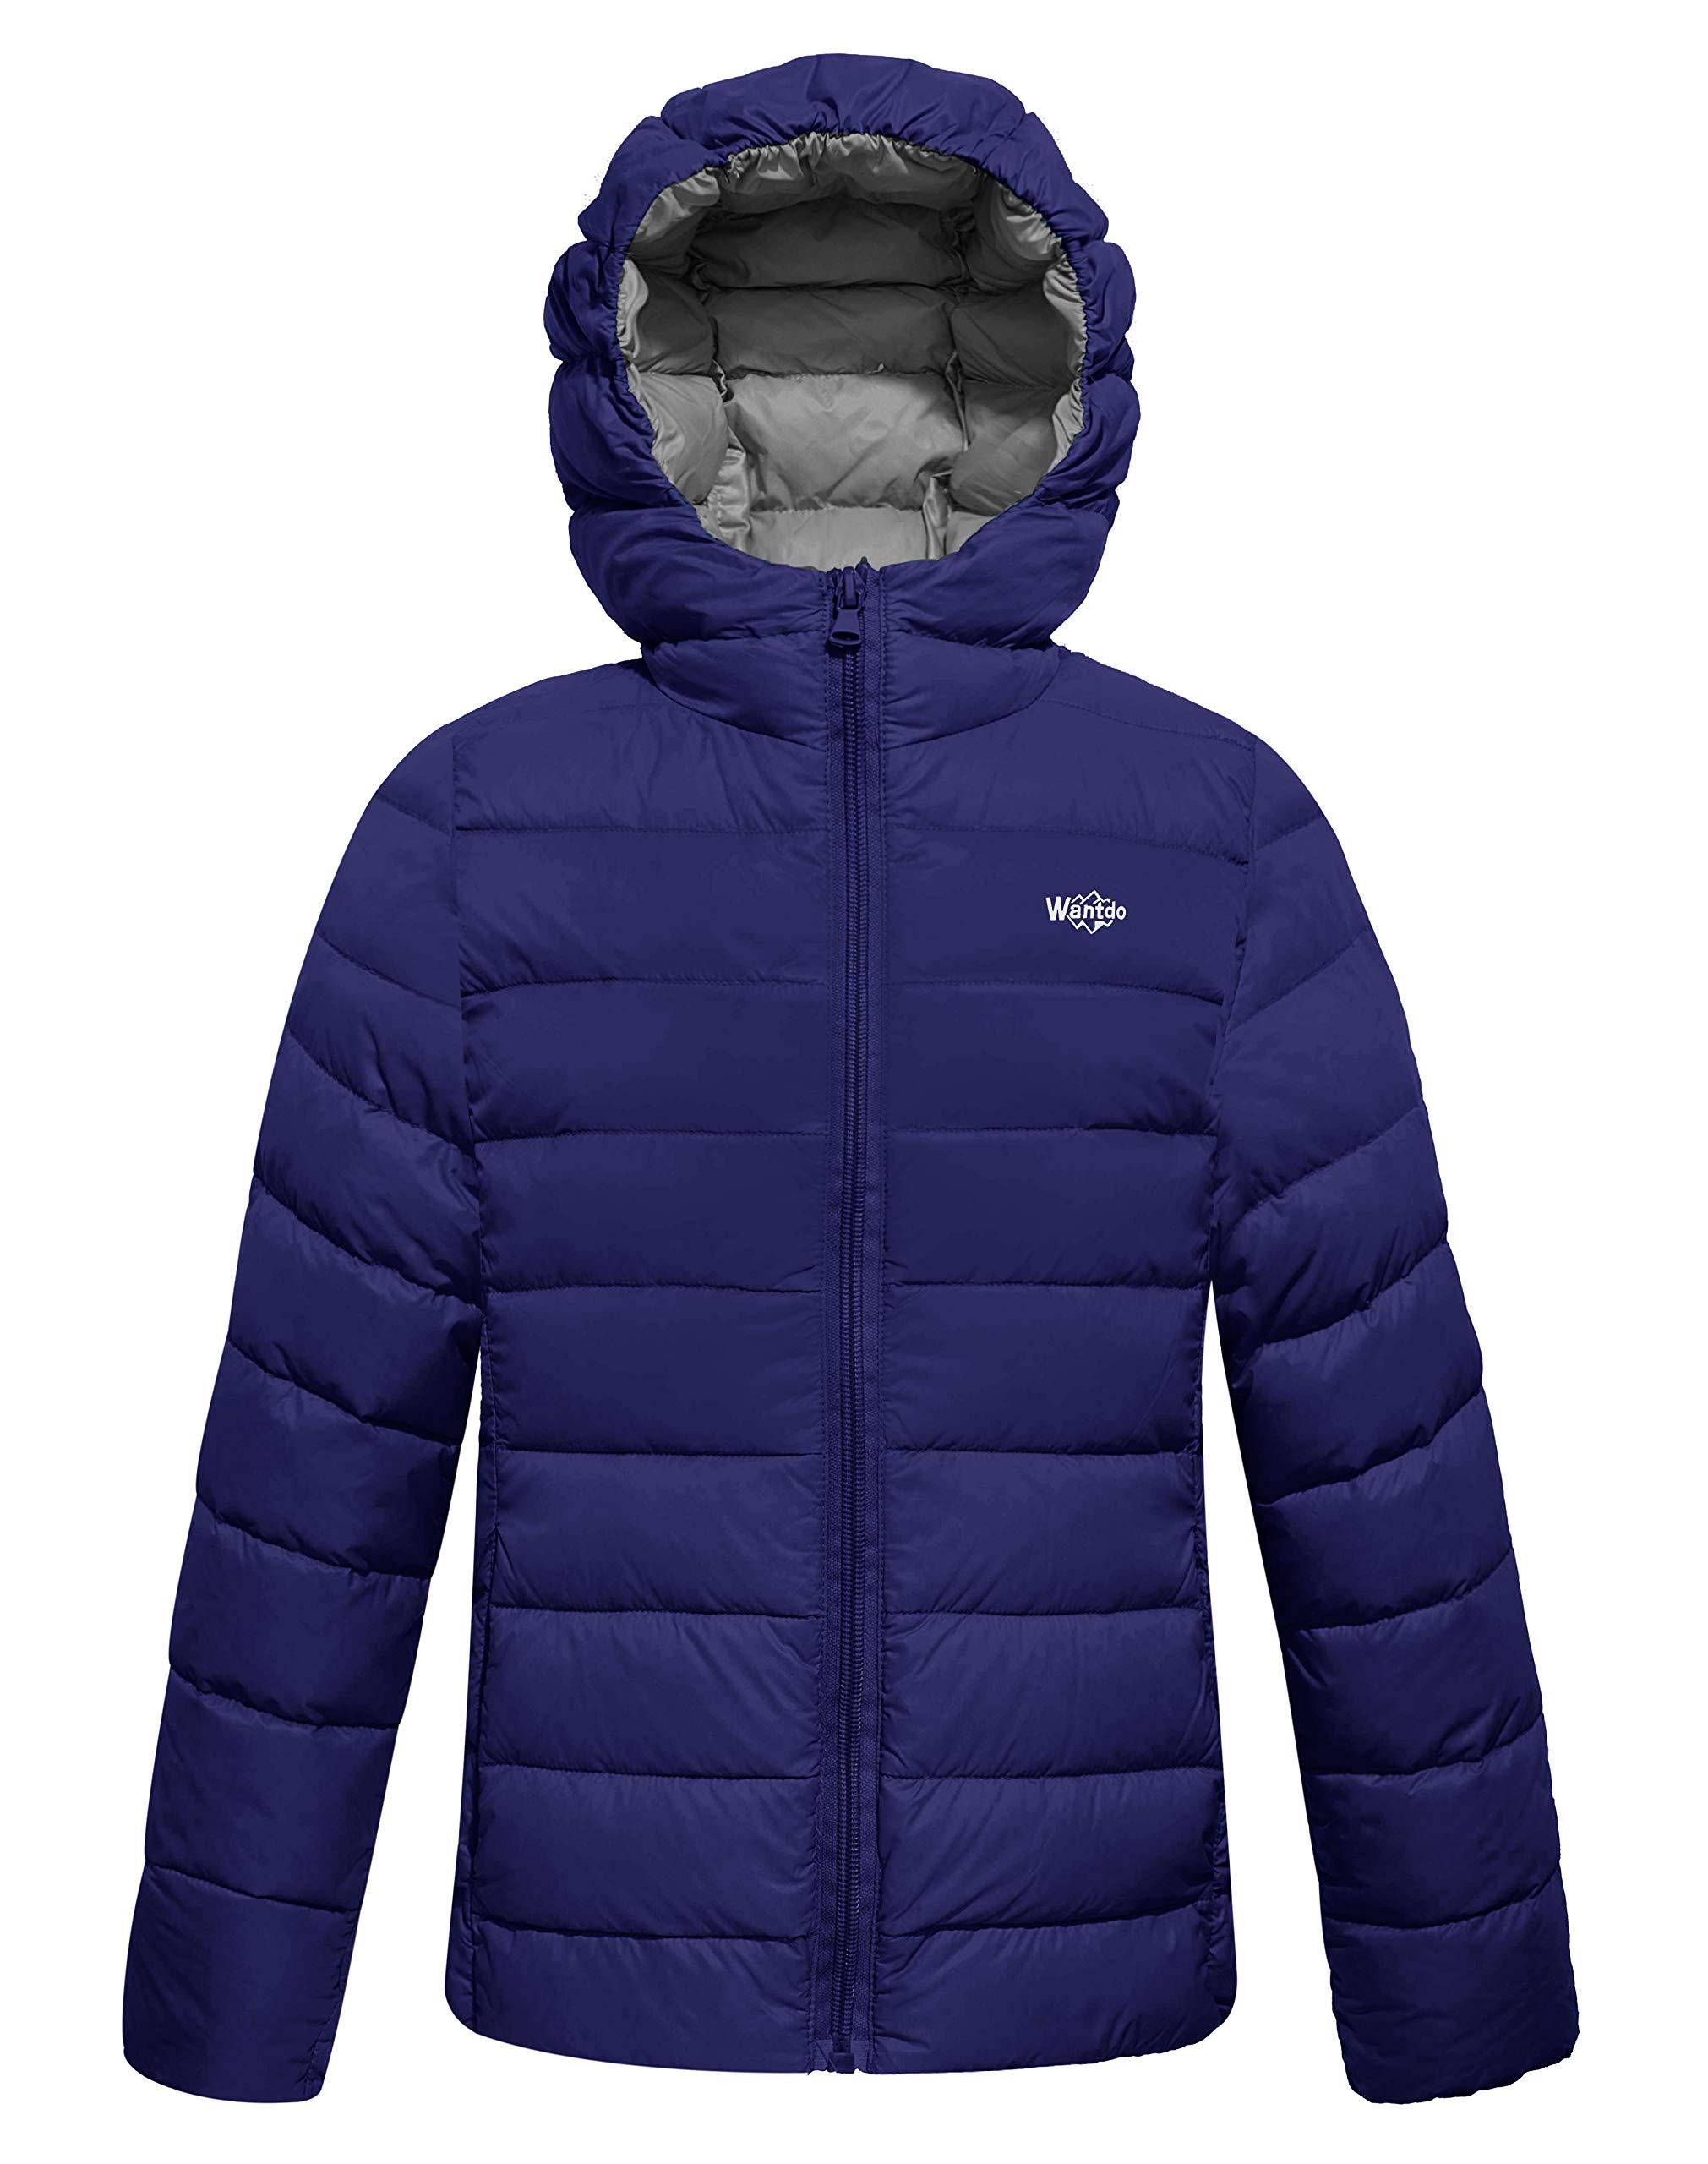 Wantdo Boy's Lightweight Puffer Down Jacket With Hood Packable Outdoor Windbreaker Navy 14/16